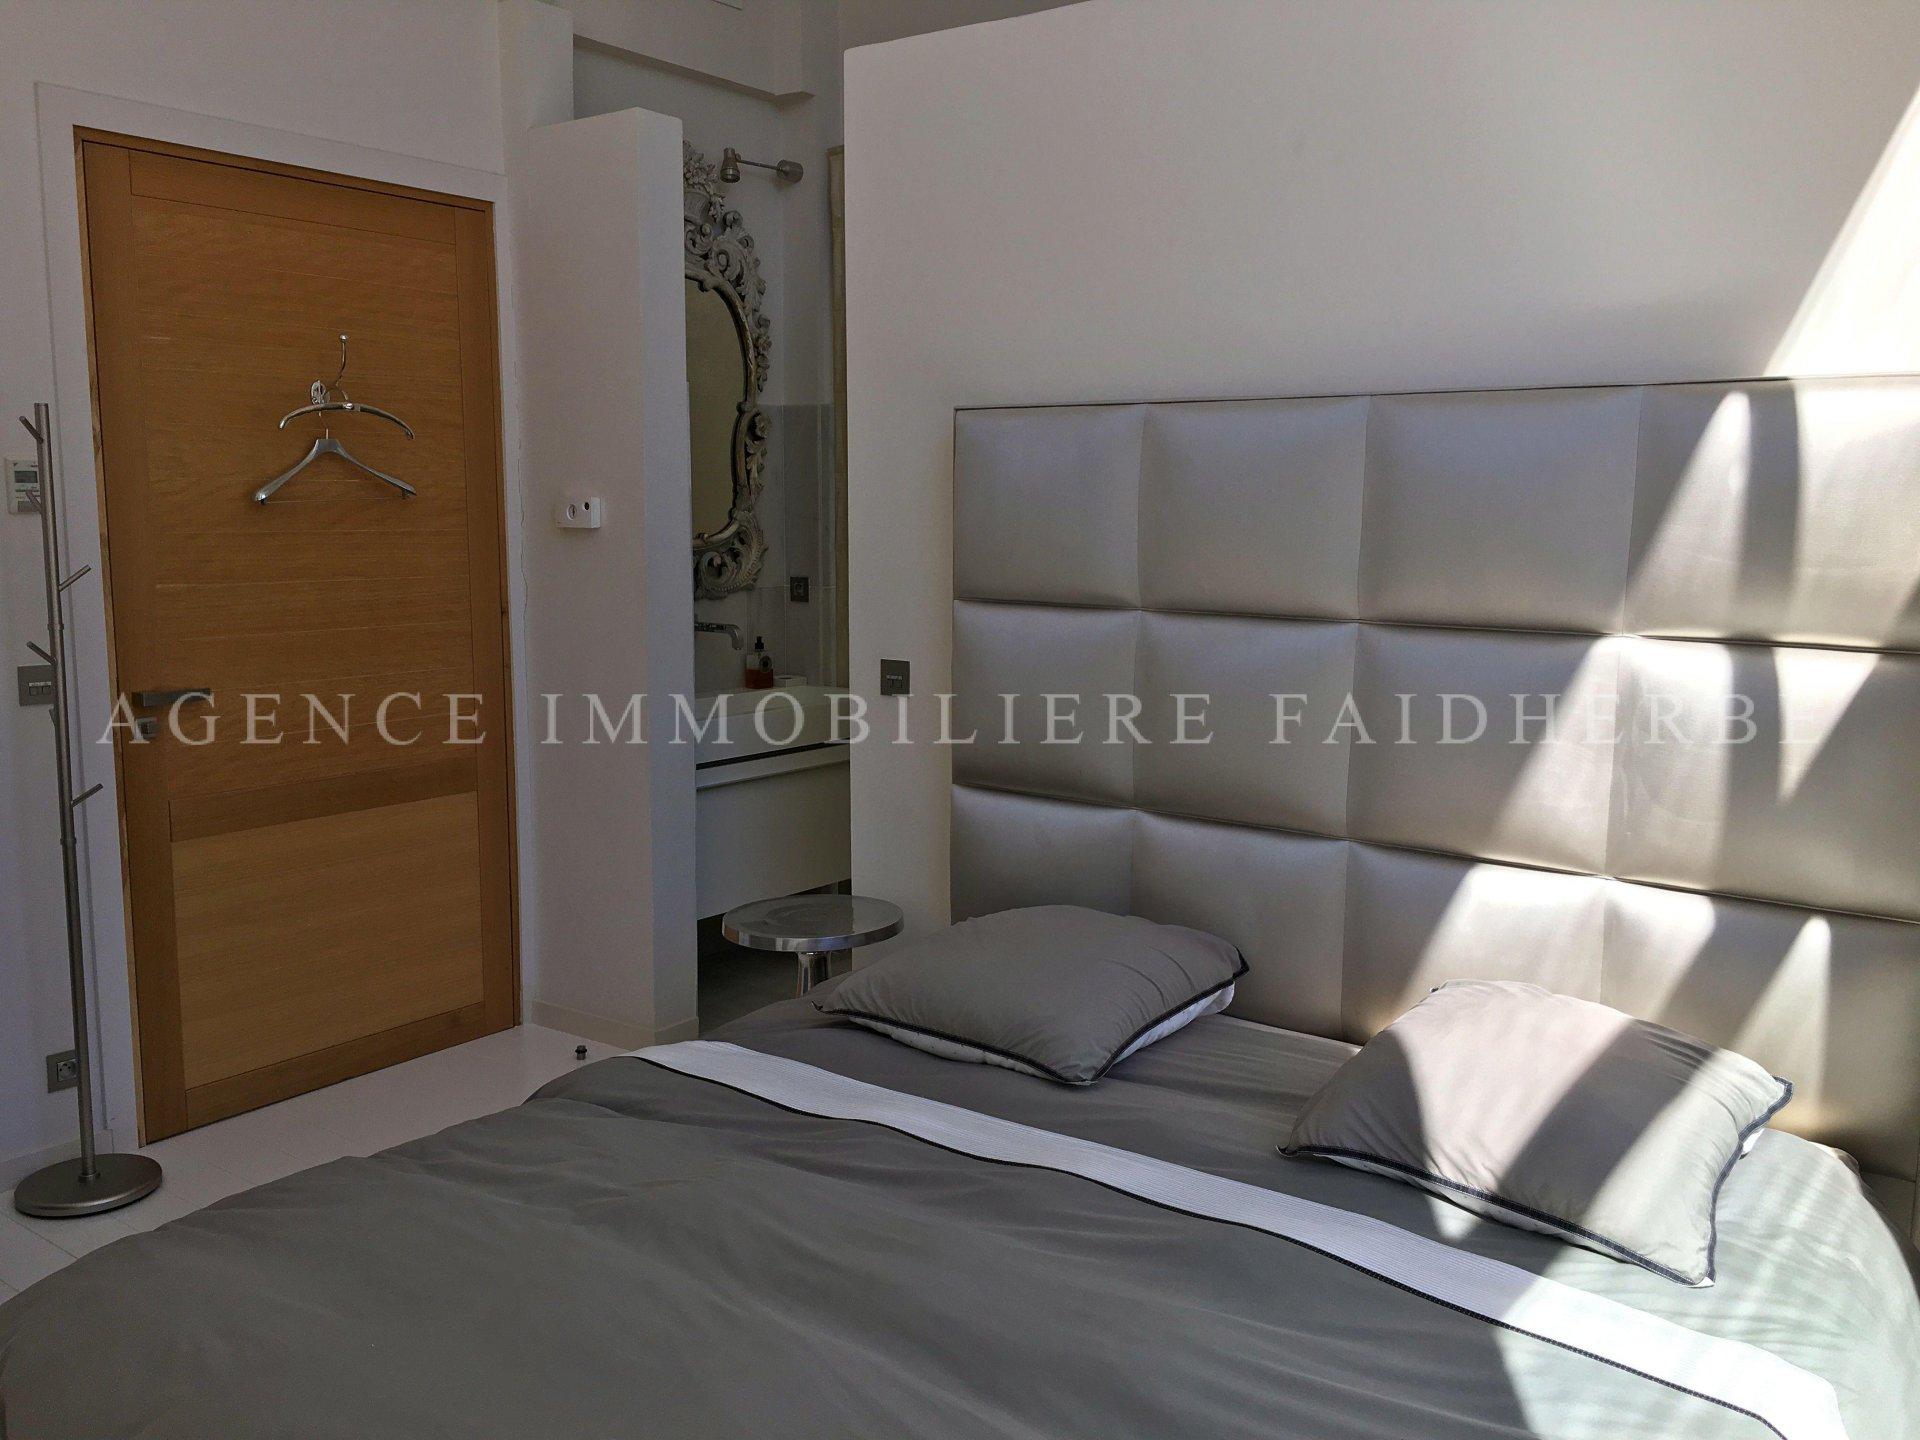 Villa contemporanea a 700 metri da Place des Lices